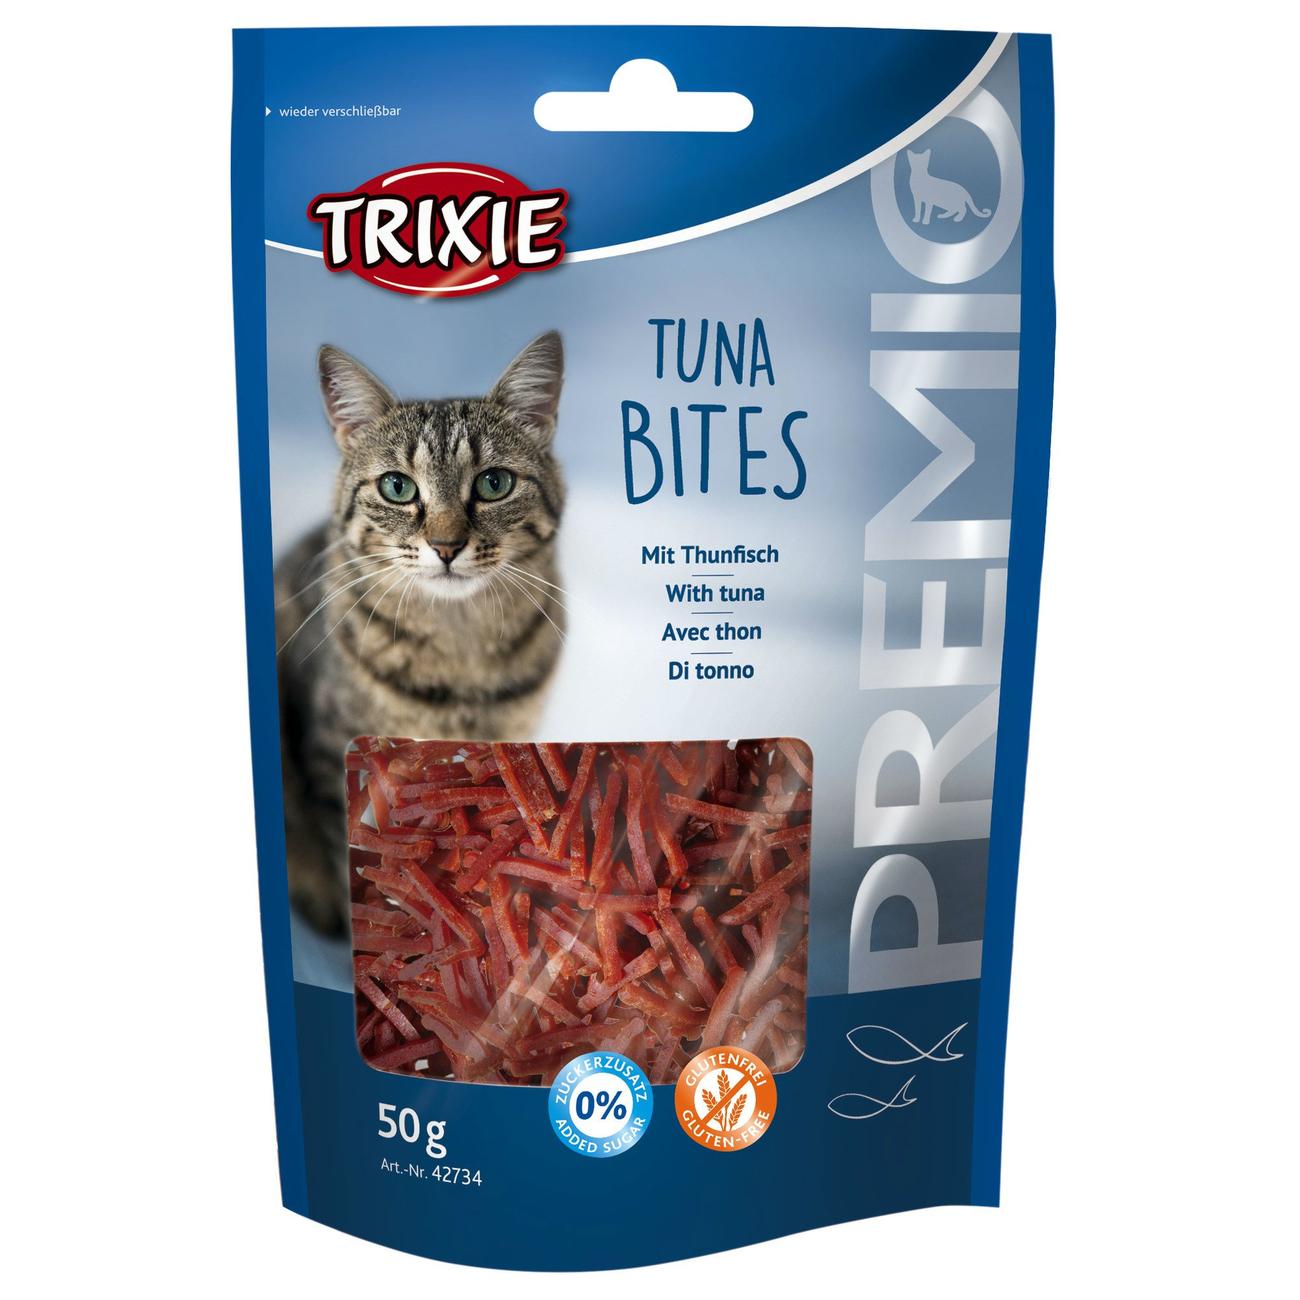 Trixie PREMIO Tuna Bites Katzenleckerlis 42734